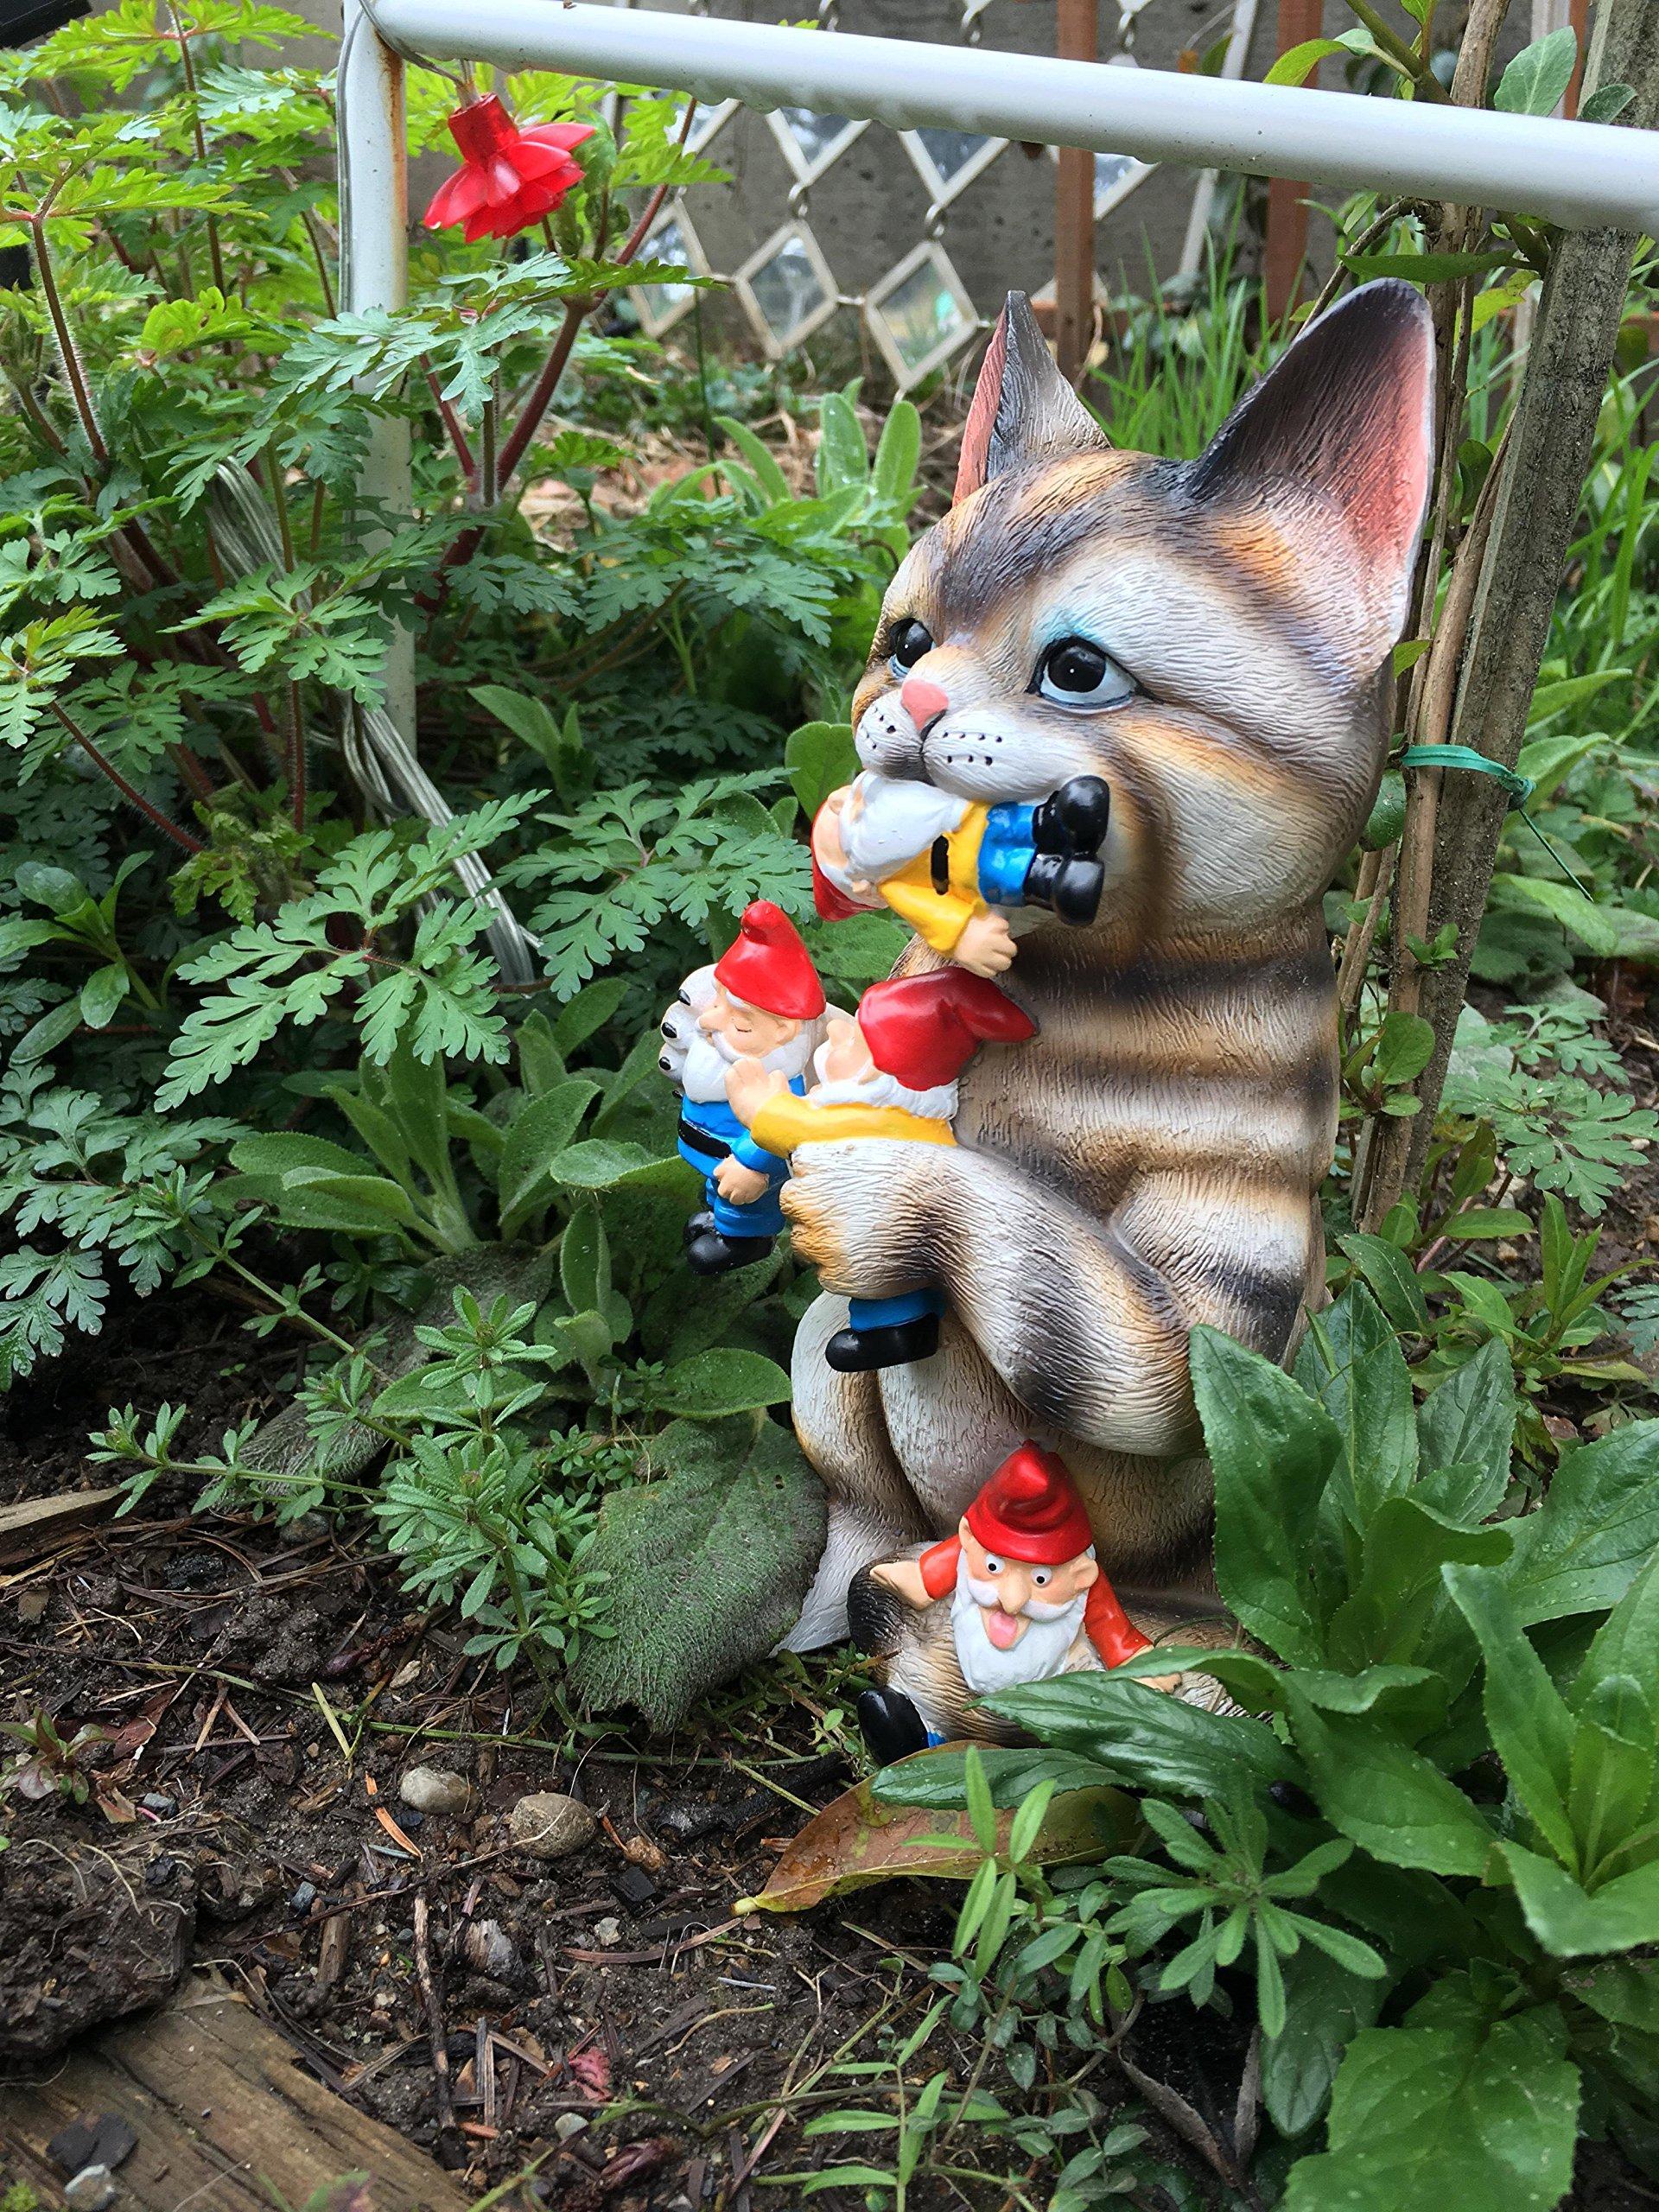 international george statue hayneedle cat elf master cast cfm stone campania product georgetheelfcaststonegardenstatue garden the